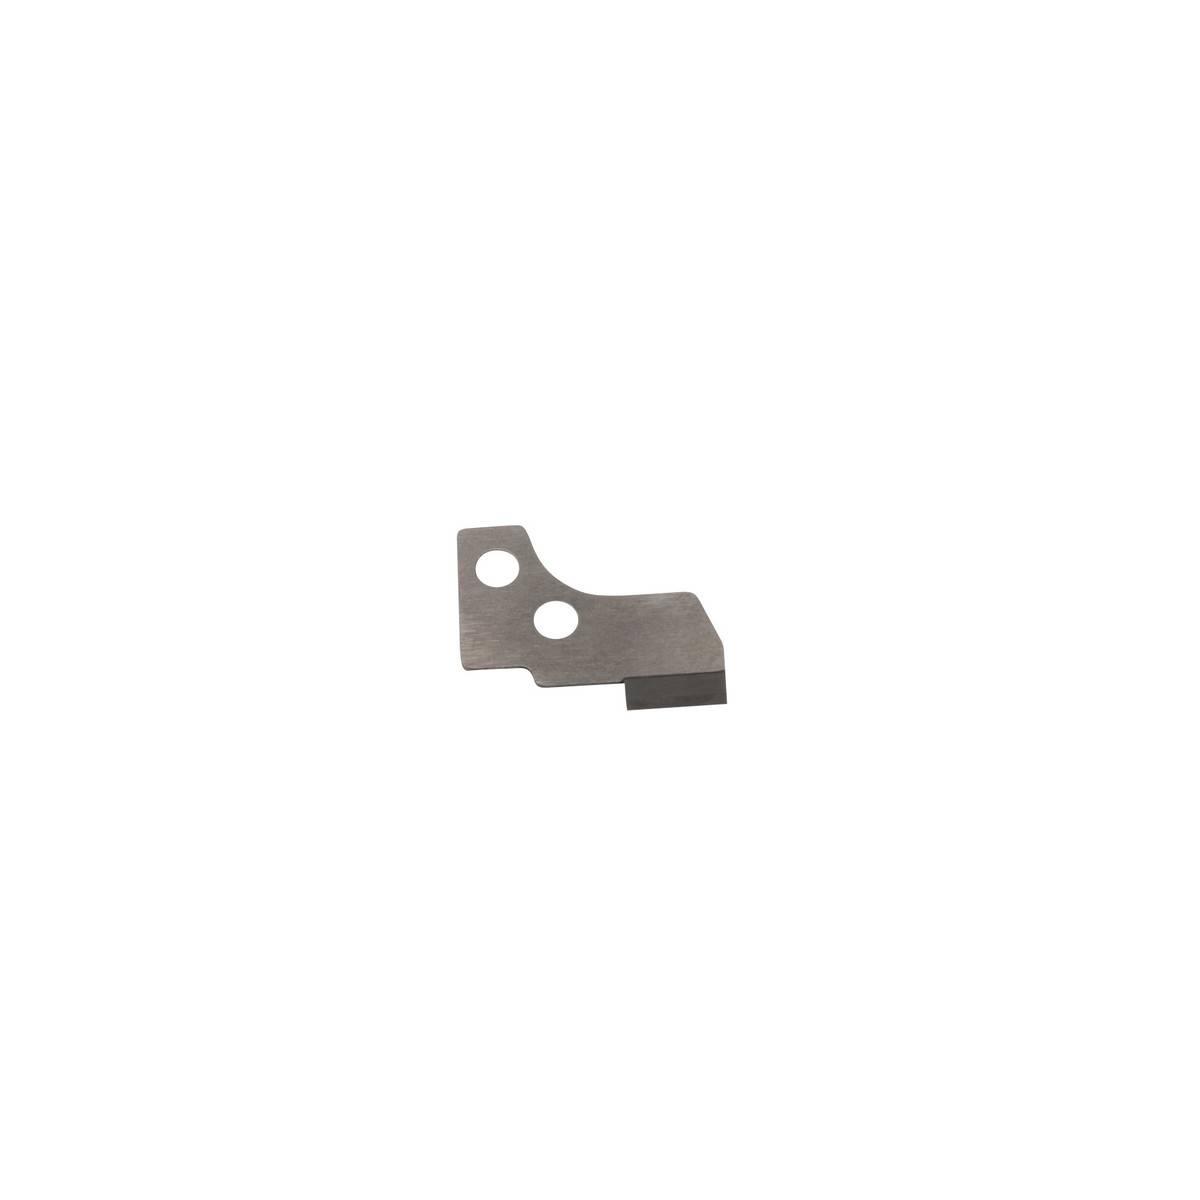 (ib) Janome Nedre kniv Lower knife (ML534)